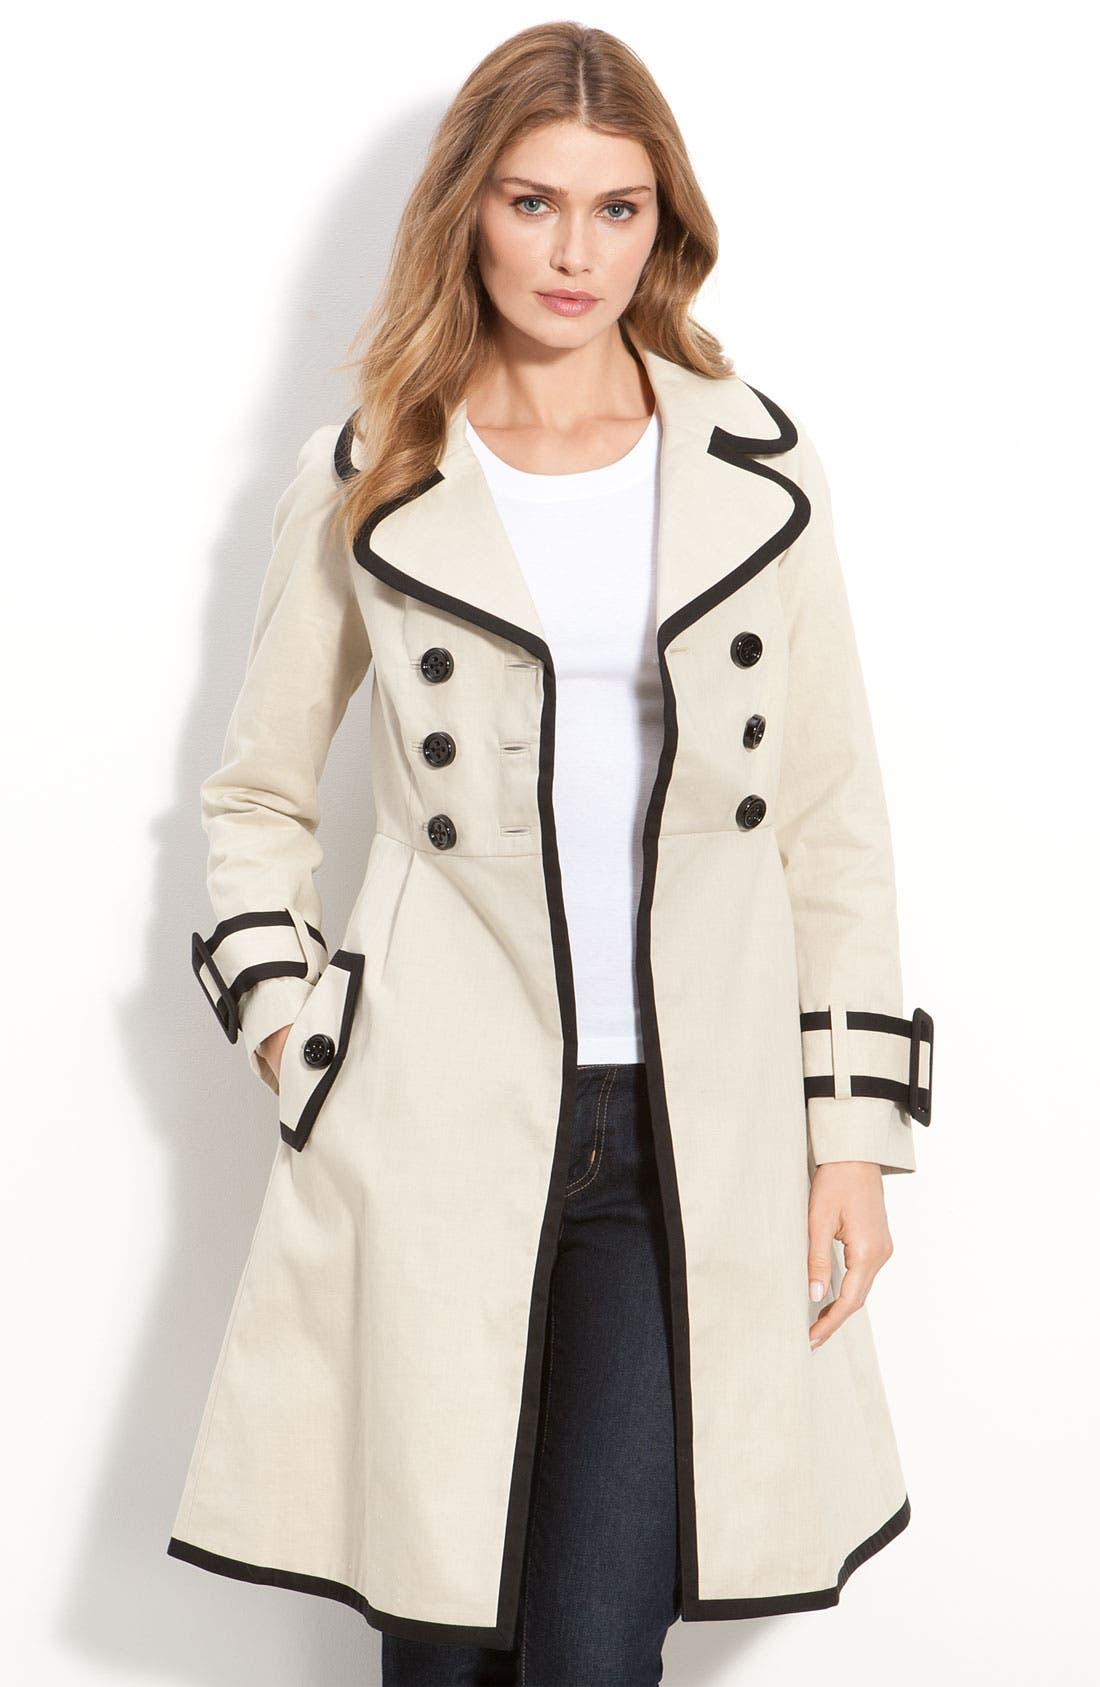 Alternate Image 1 Selected - kate spade new york 'topliner' contrast trim trench coat